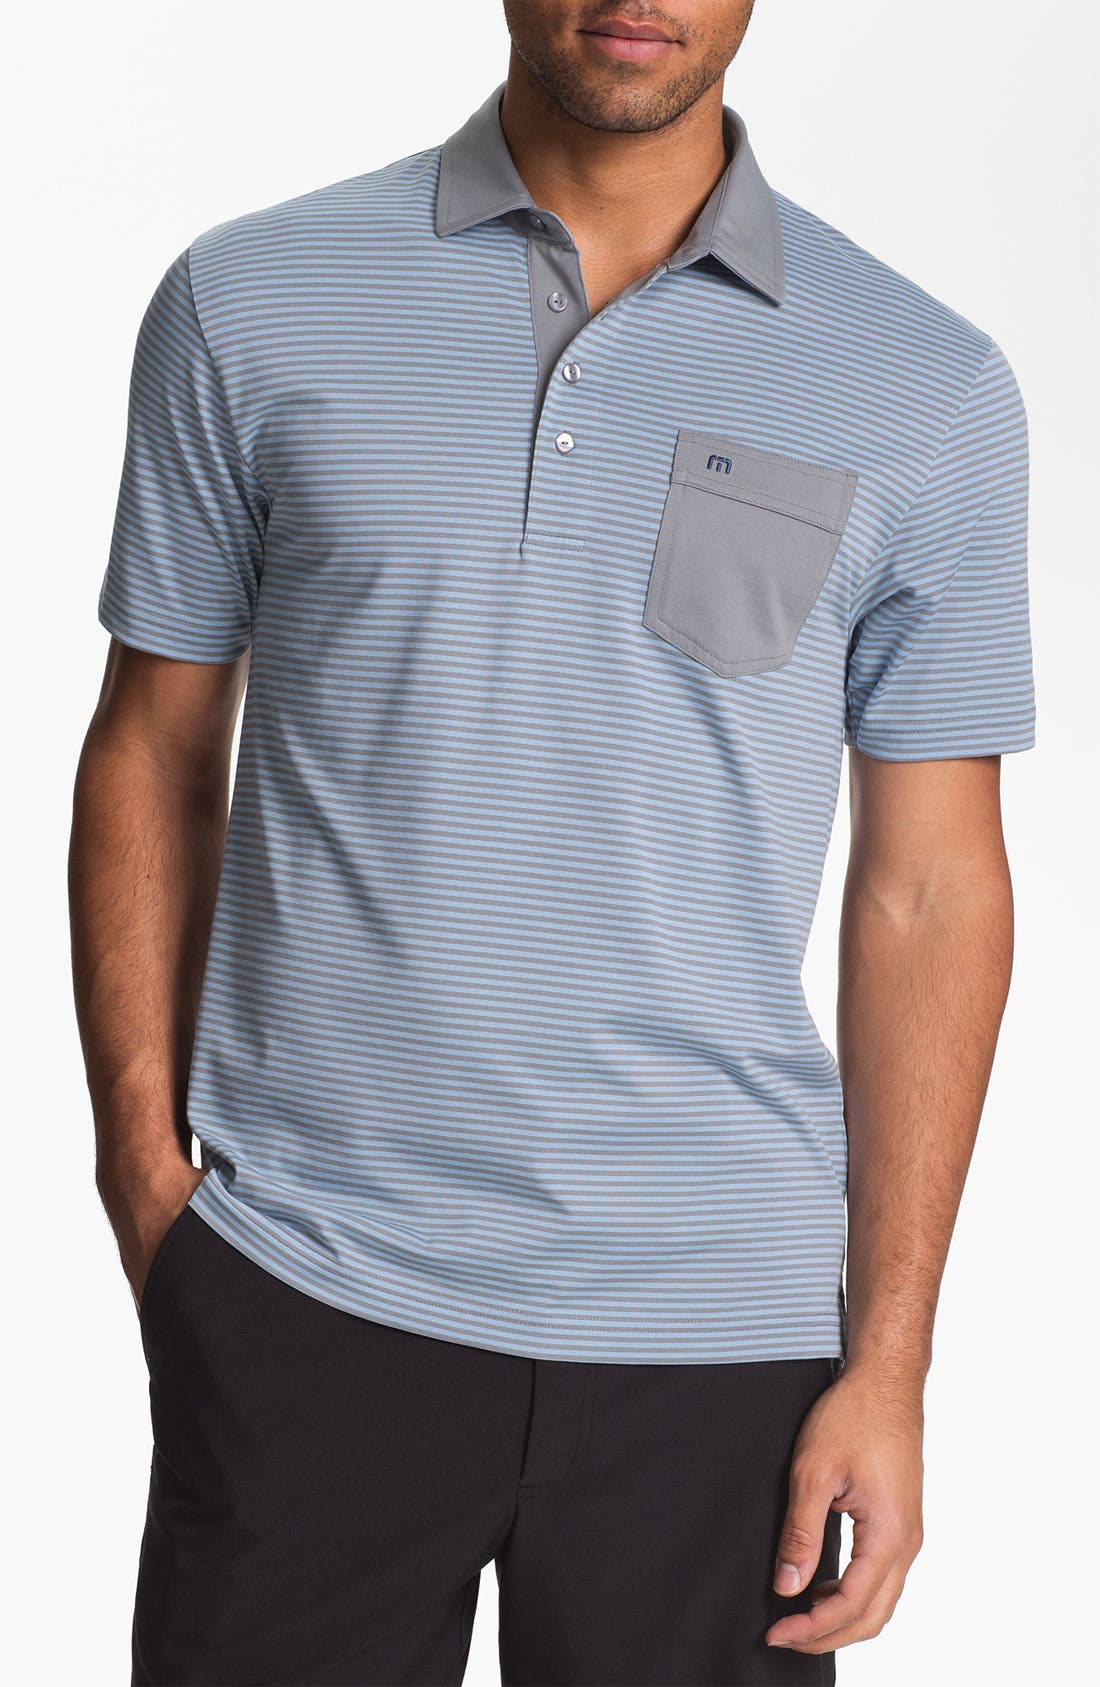 Alternate Image 1 Selected - Travis Mathew 'Mallinger' Regular Fit Golf Polo